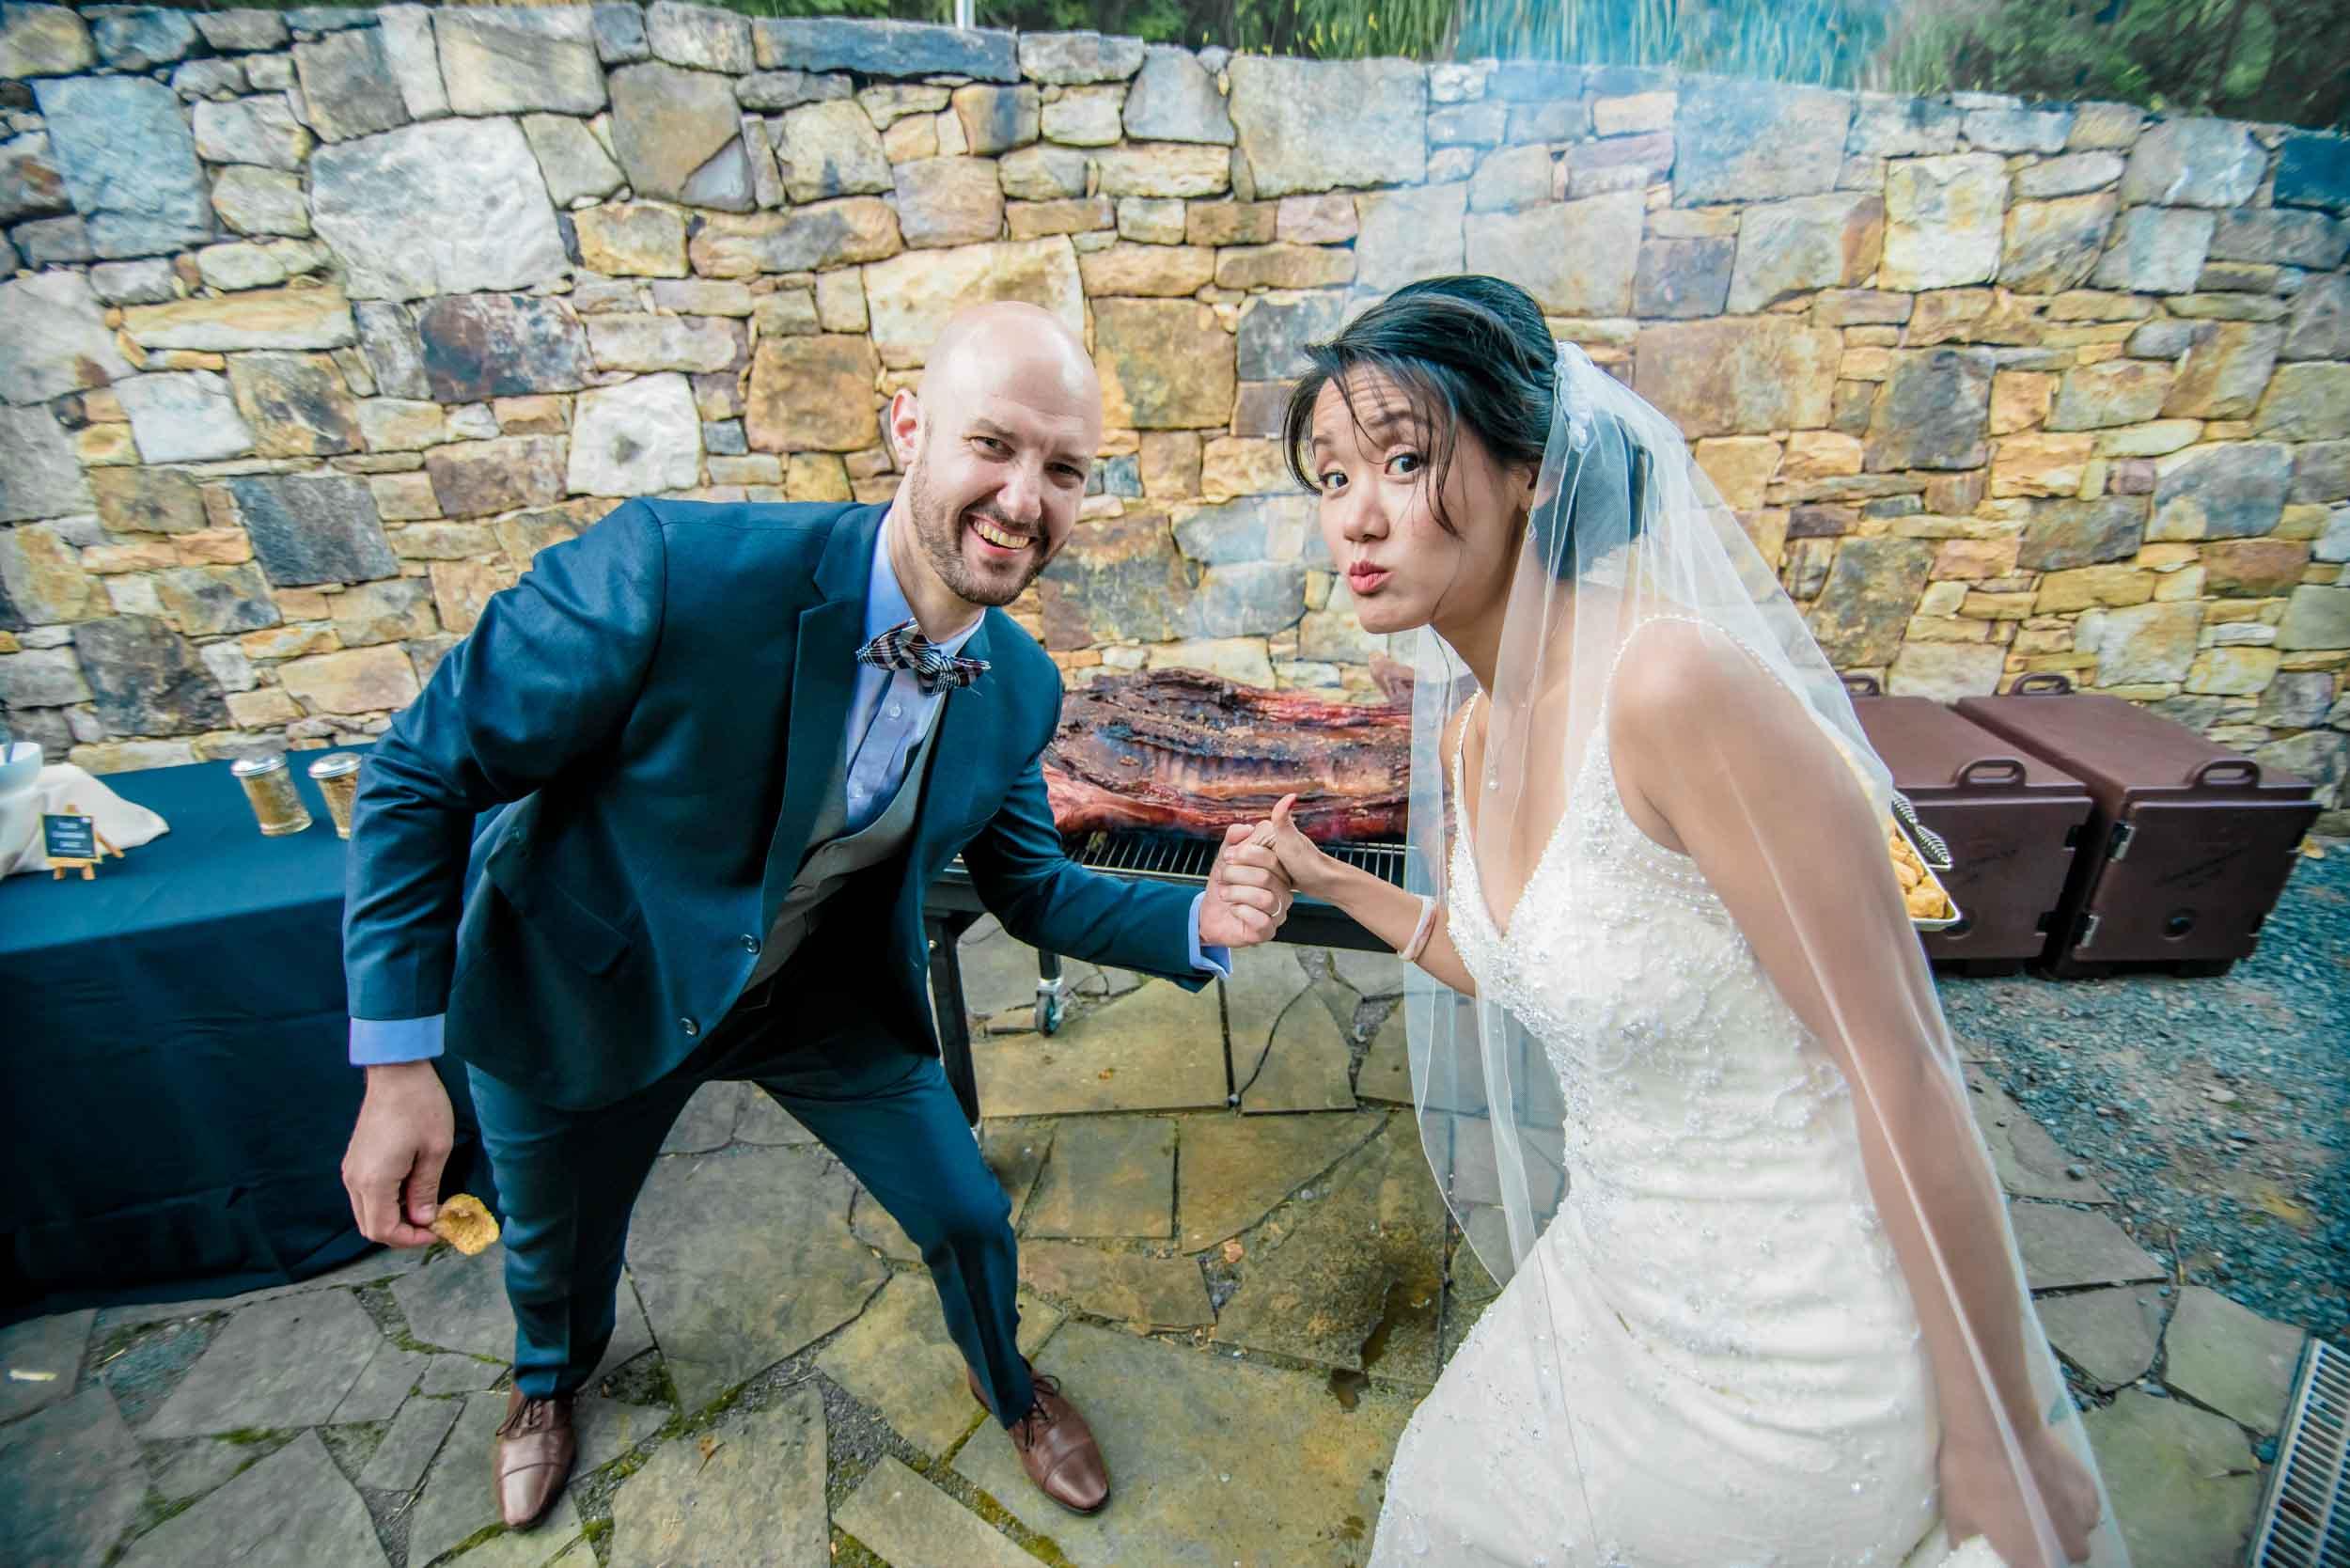 dc+metro+wedding+photographer+vadym+guliuk+photography+wedding+bride+and+groom-2062.jpg